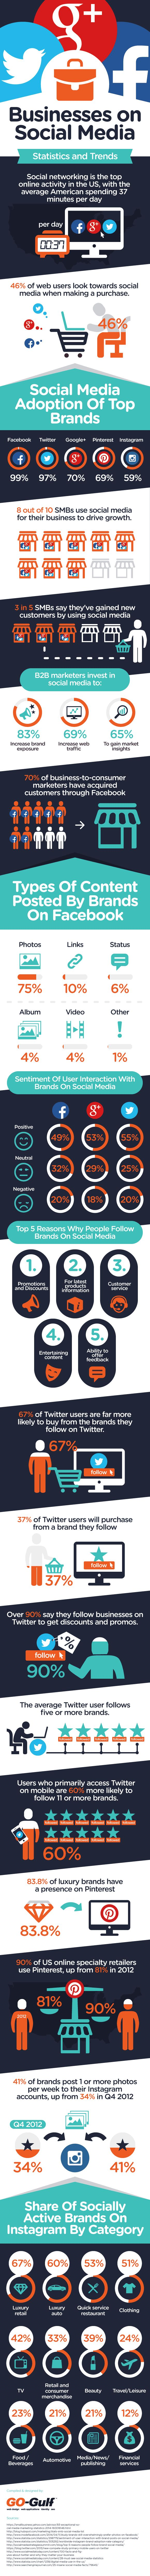 Facebook, Google+, Twitter, Pinterest Instagram  -Social Media Marketing Trends 2014 - #infographic #SocialMedia #business